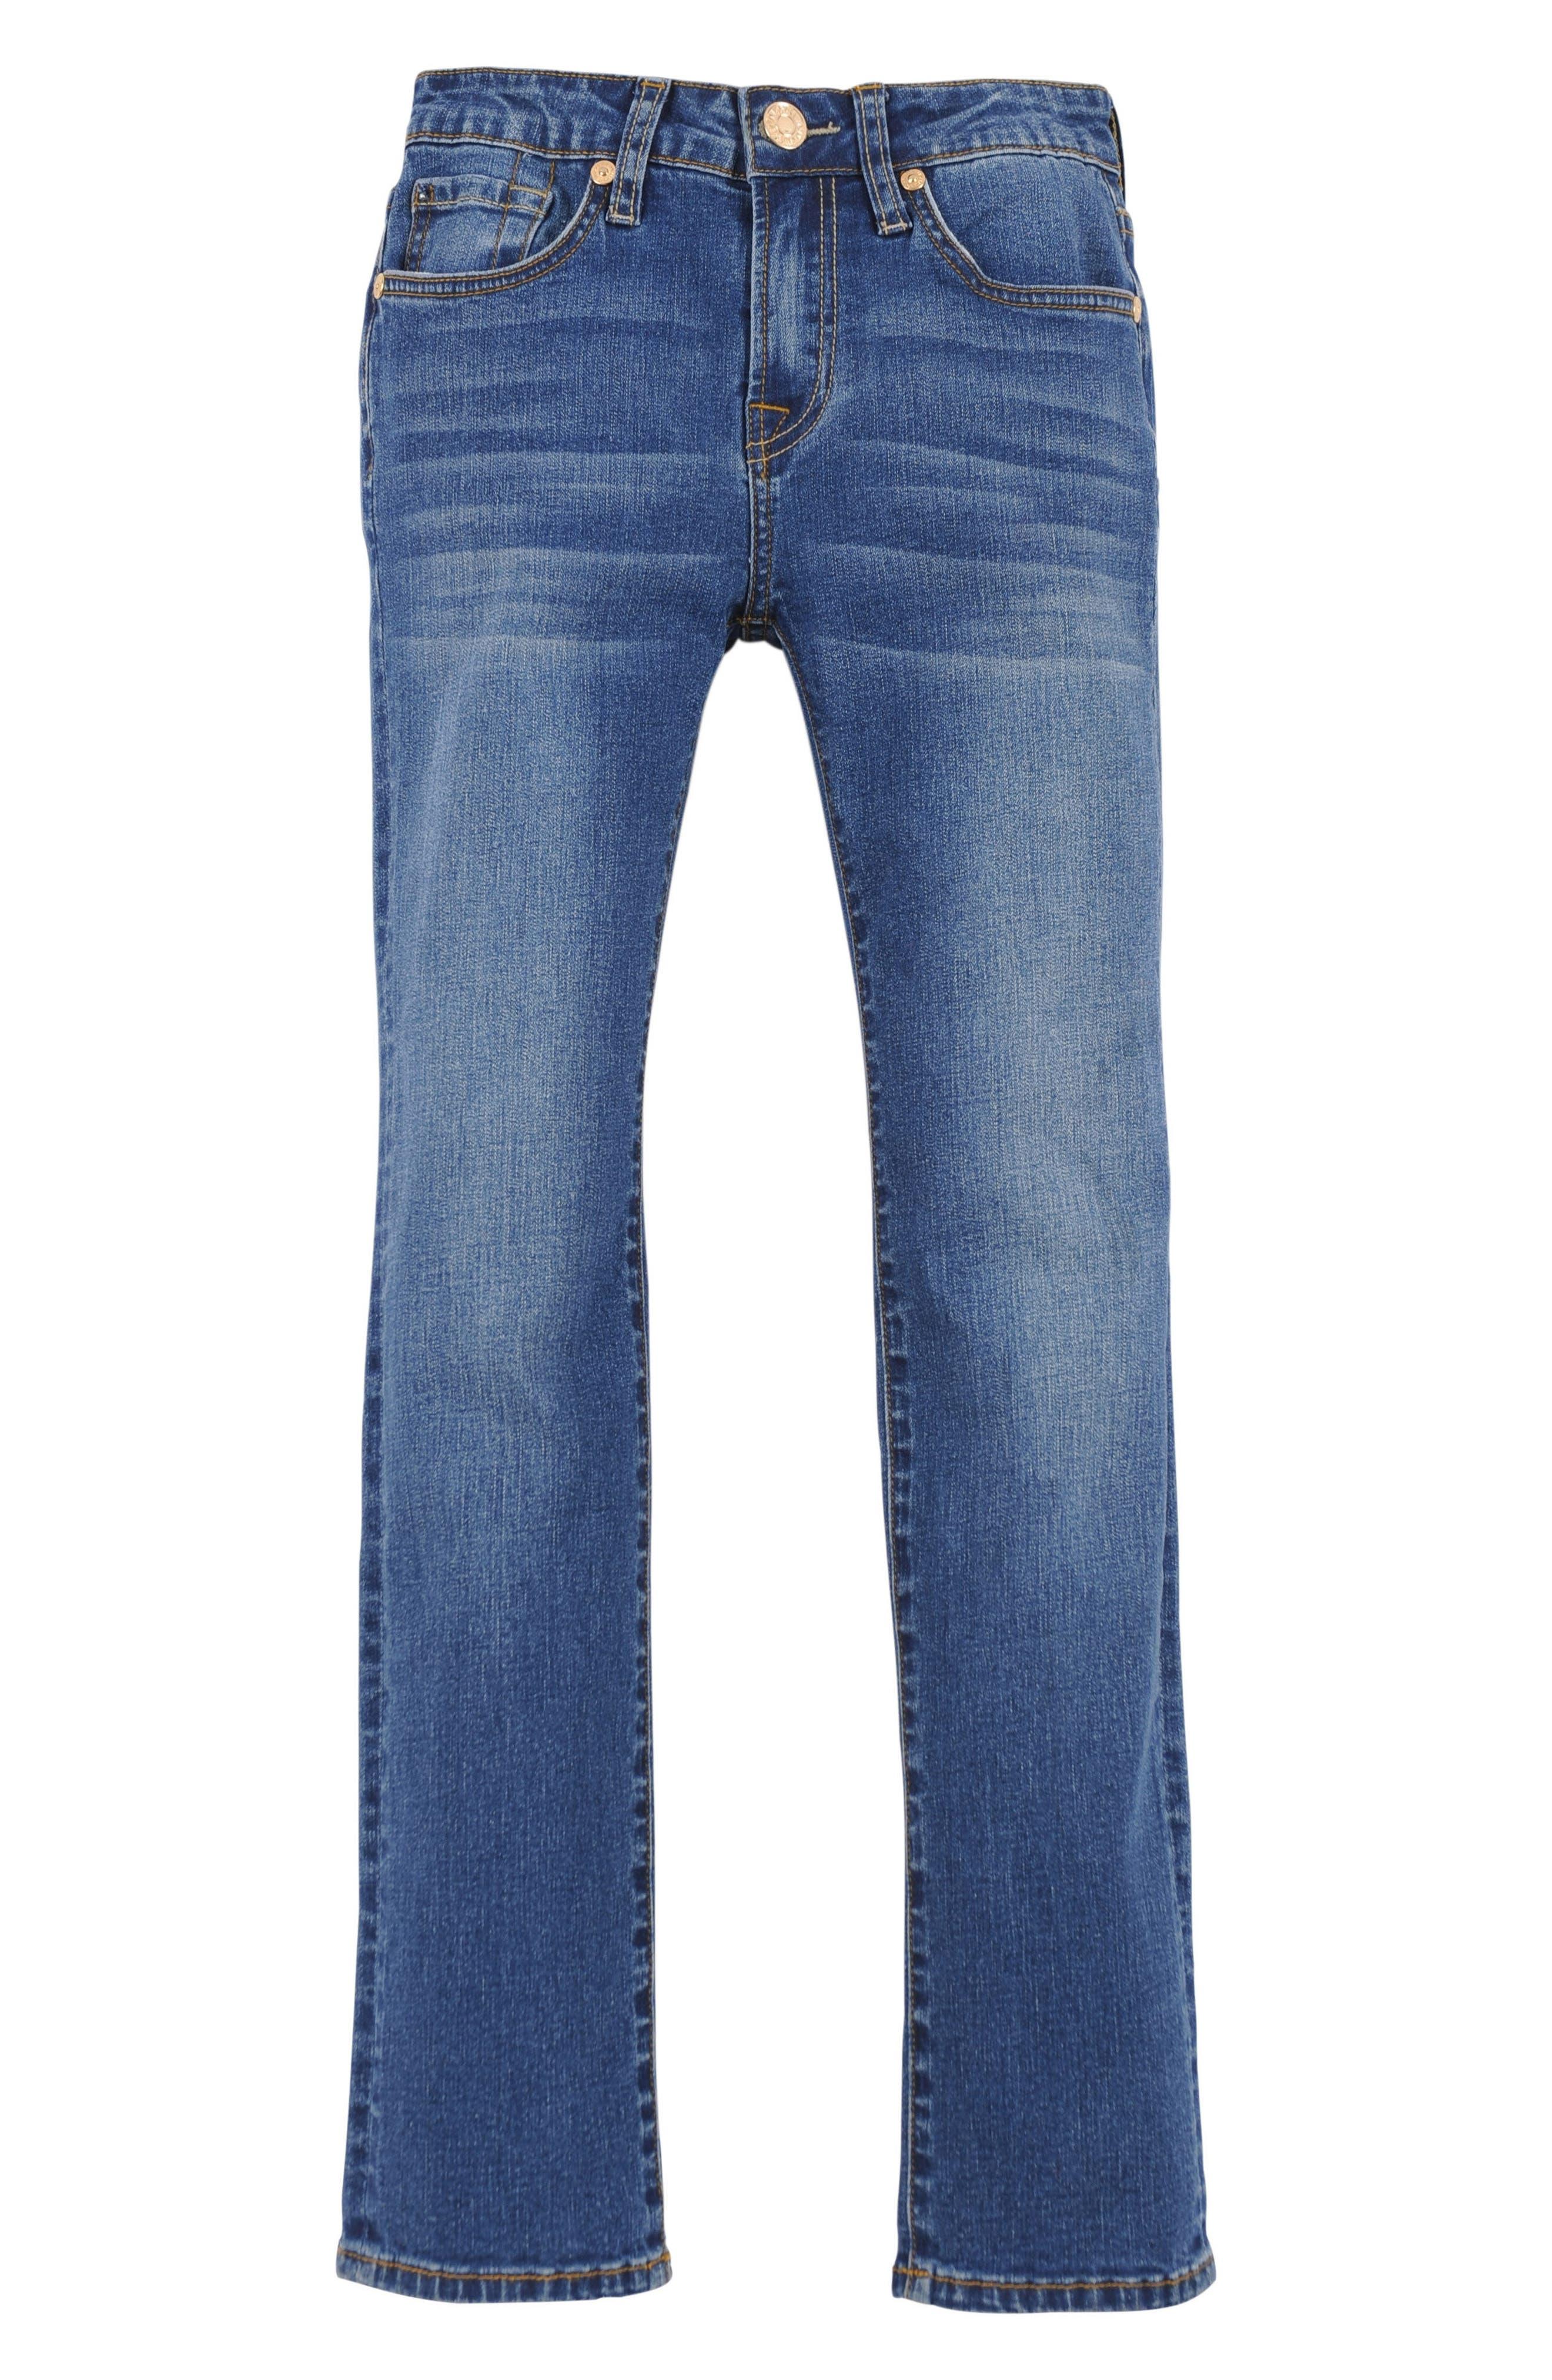 Slimmy Foolproof Slim Fit Jeans,                         Main,                         color, Bristol